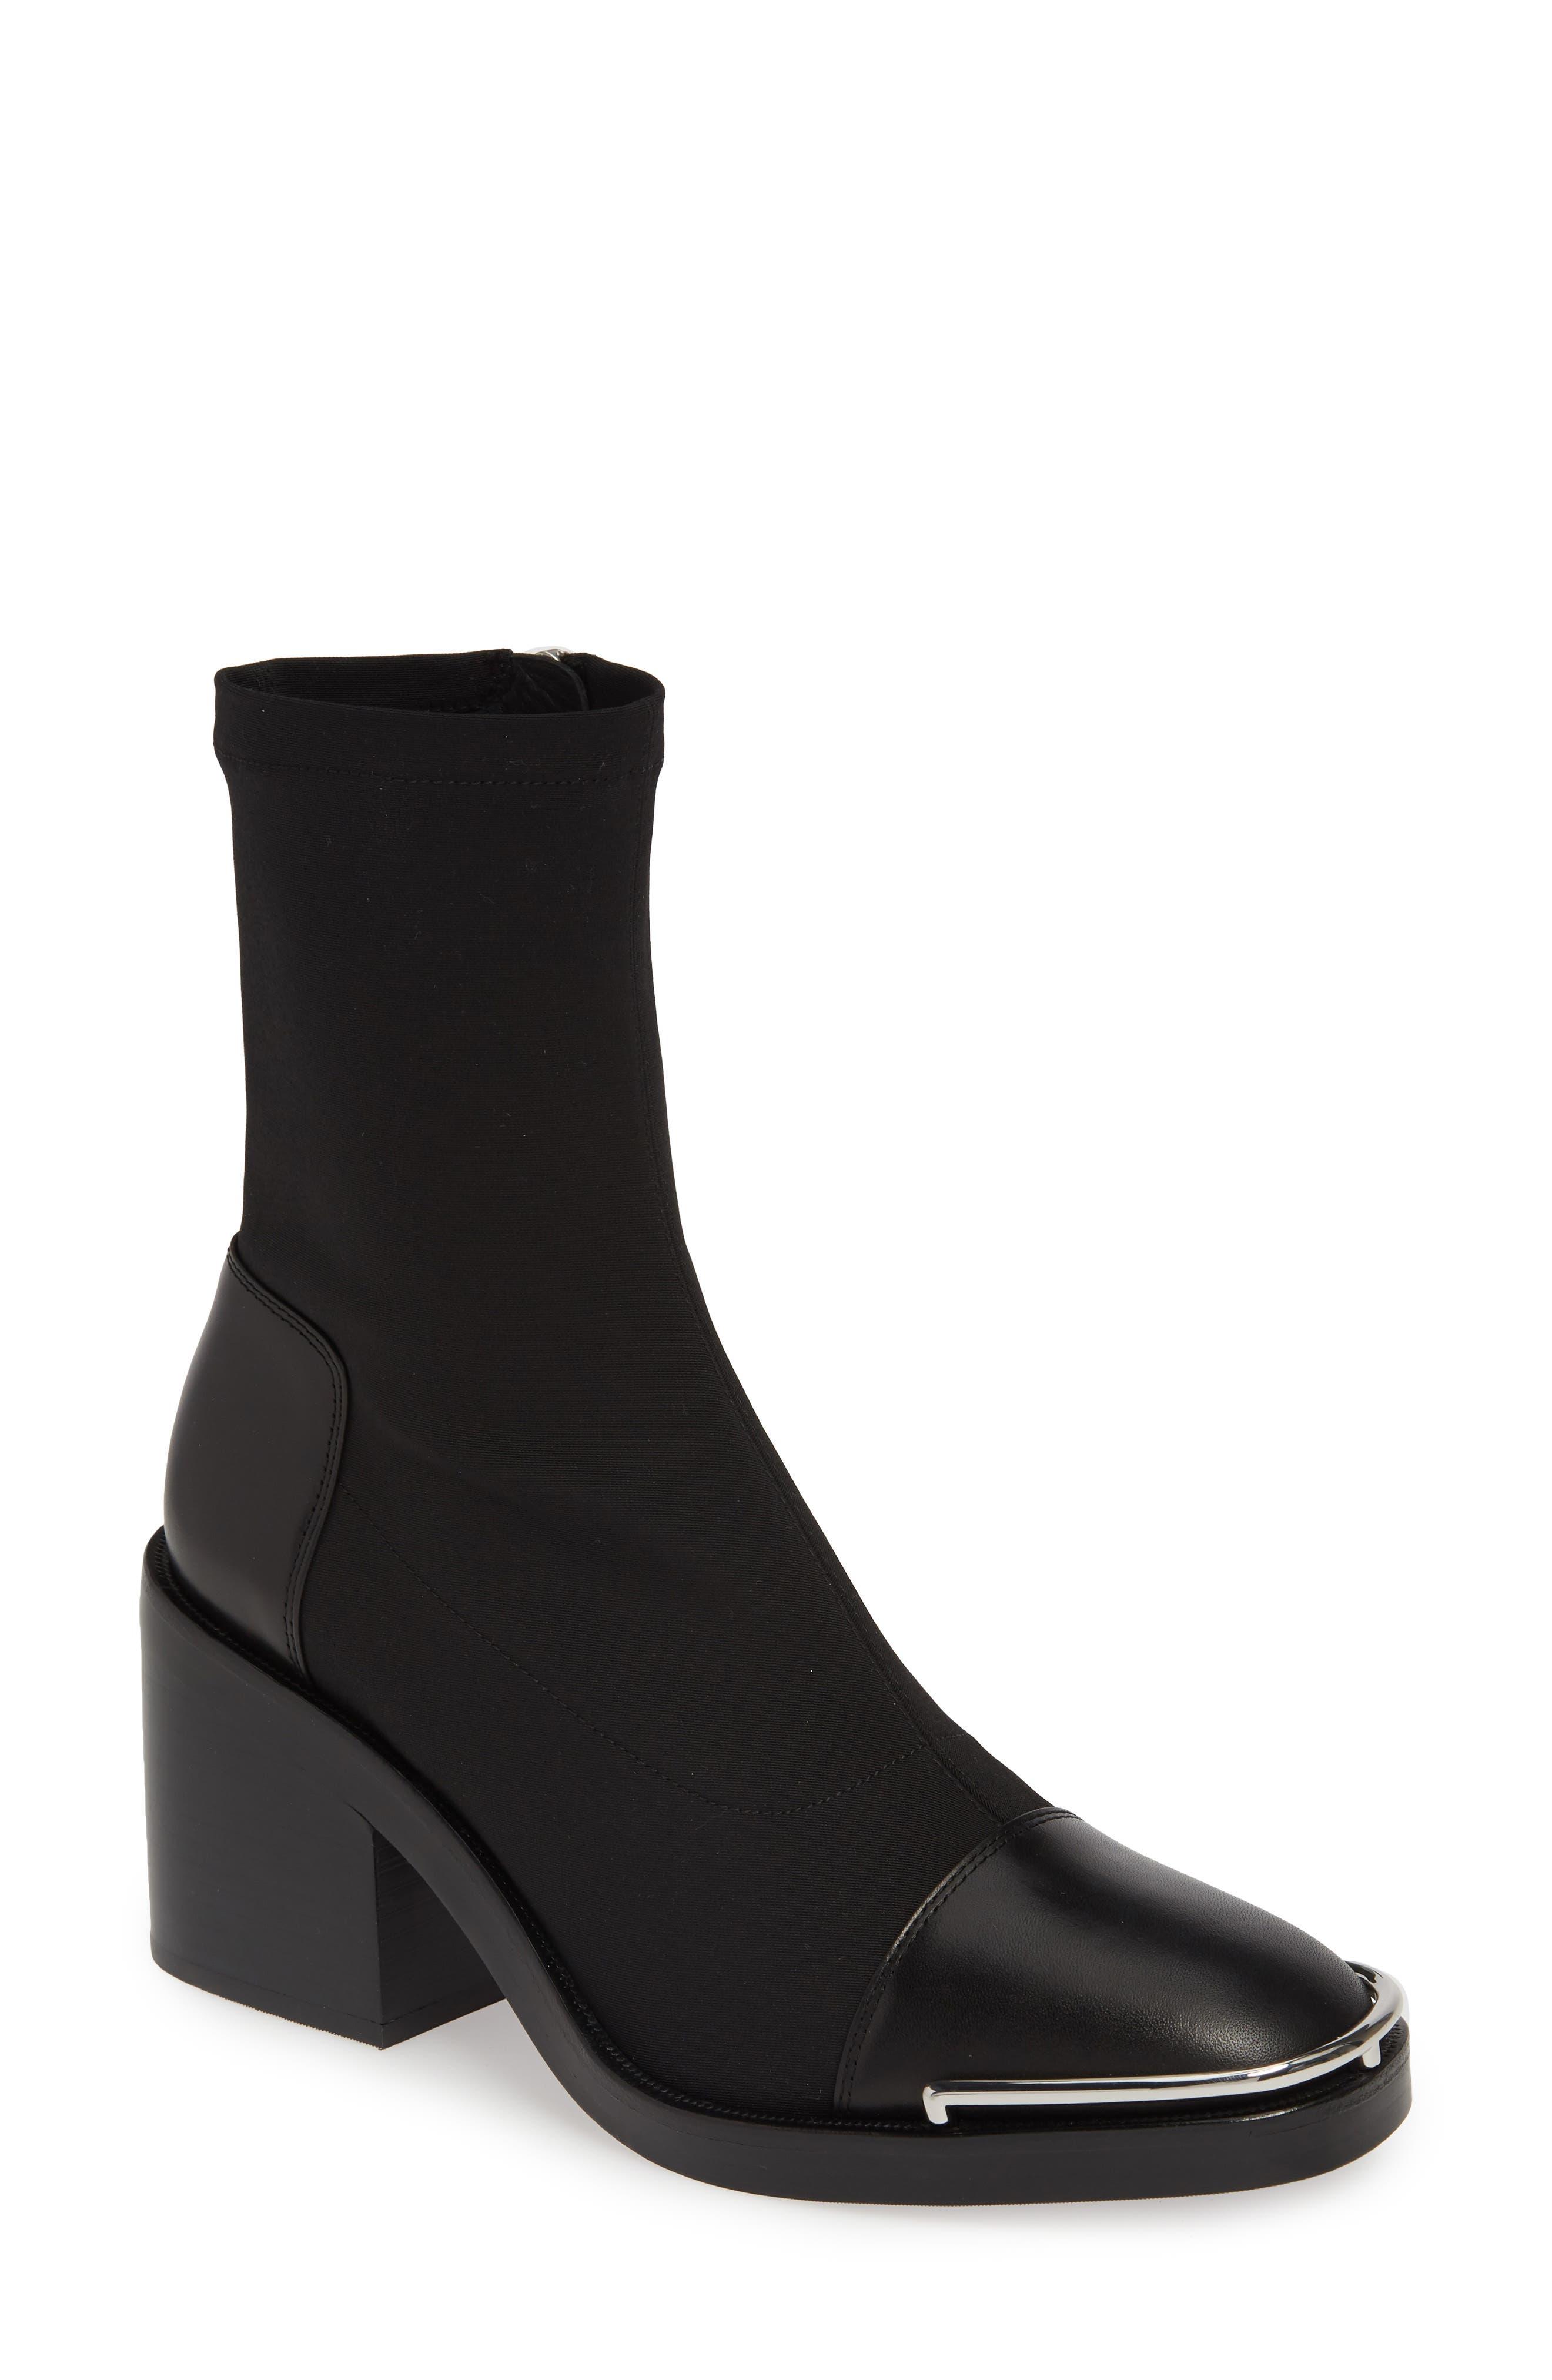 Alexander Wang Hailey Halo Sock Bootie - Black